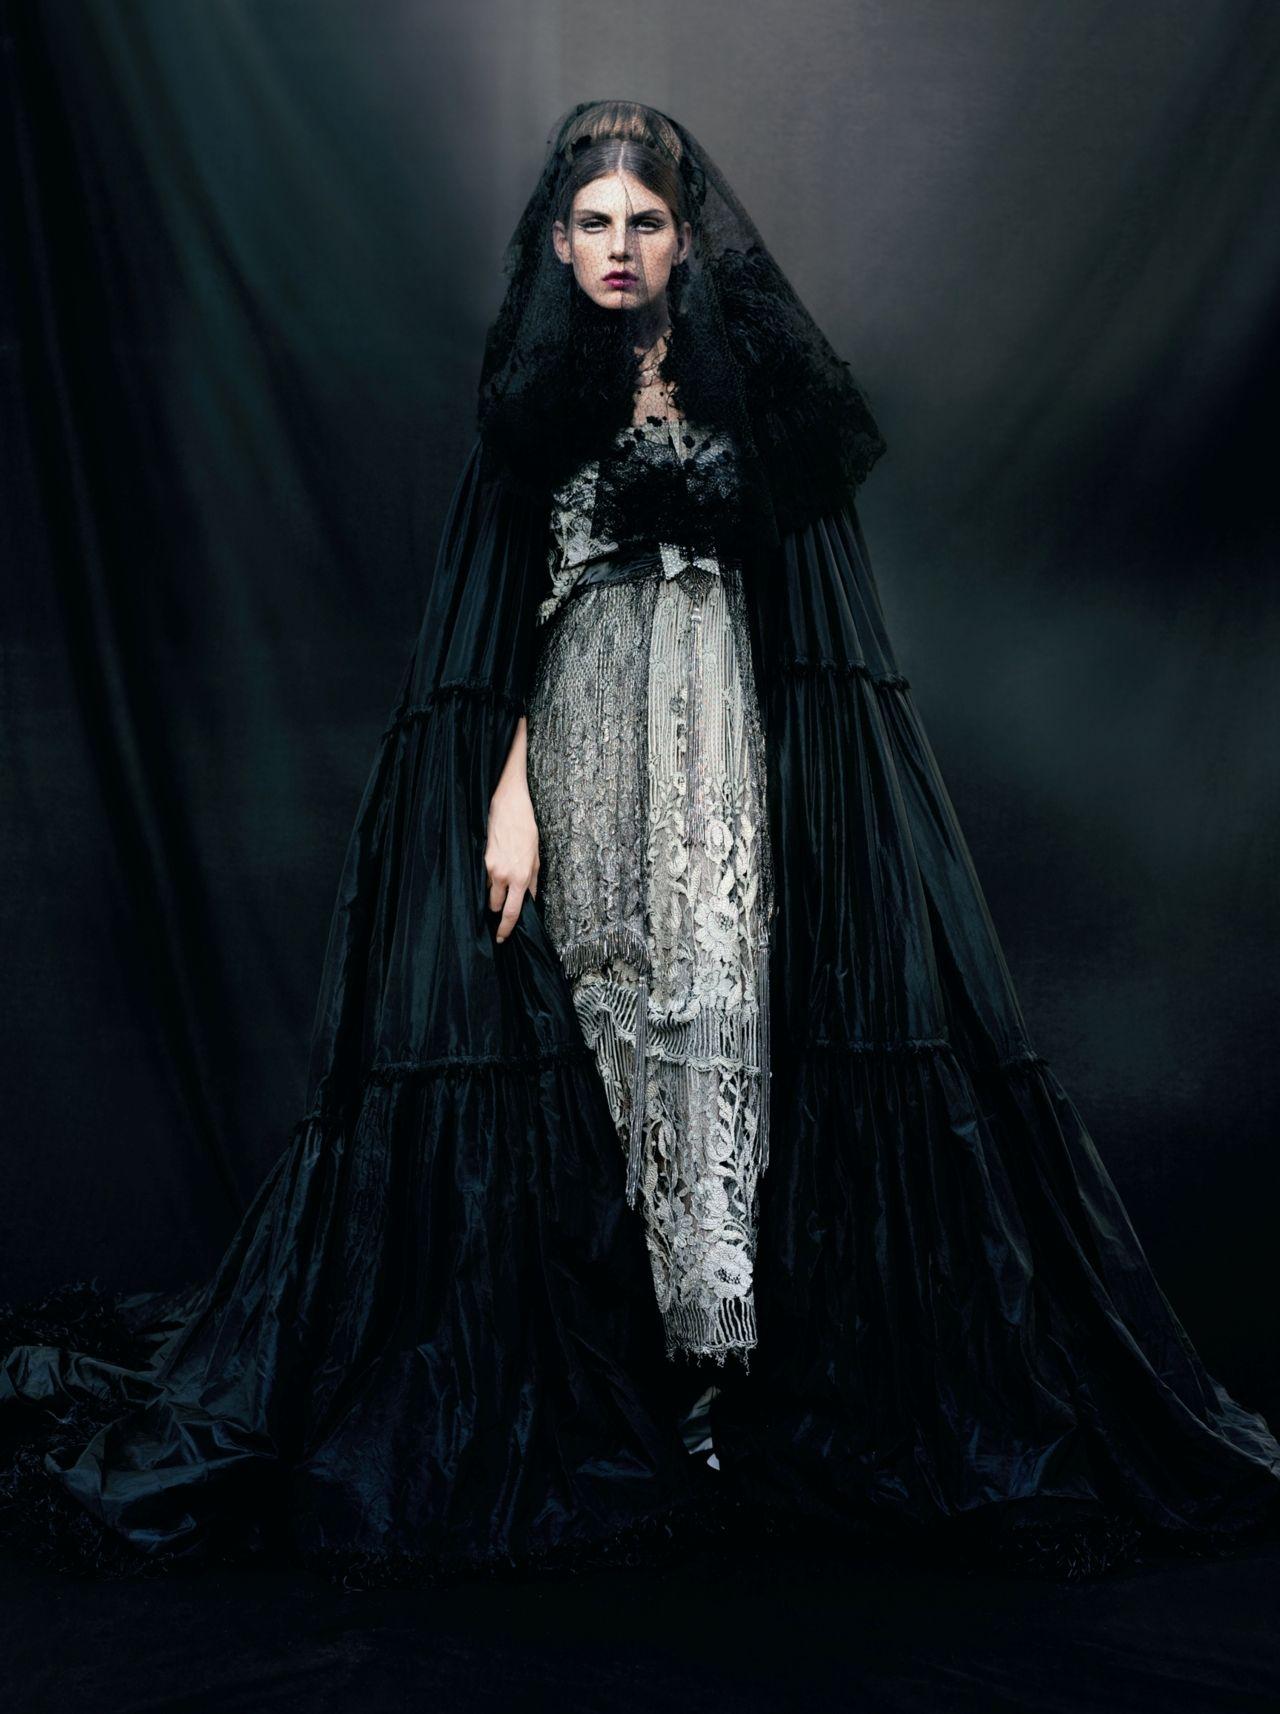 Mourning cloak.